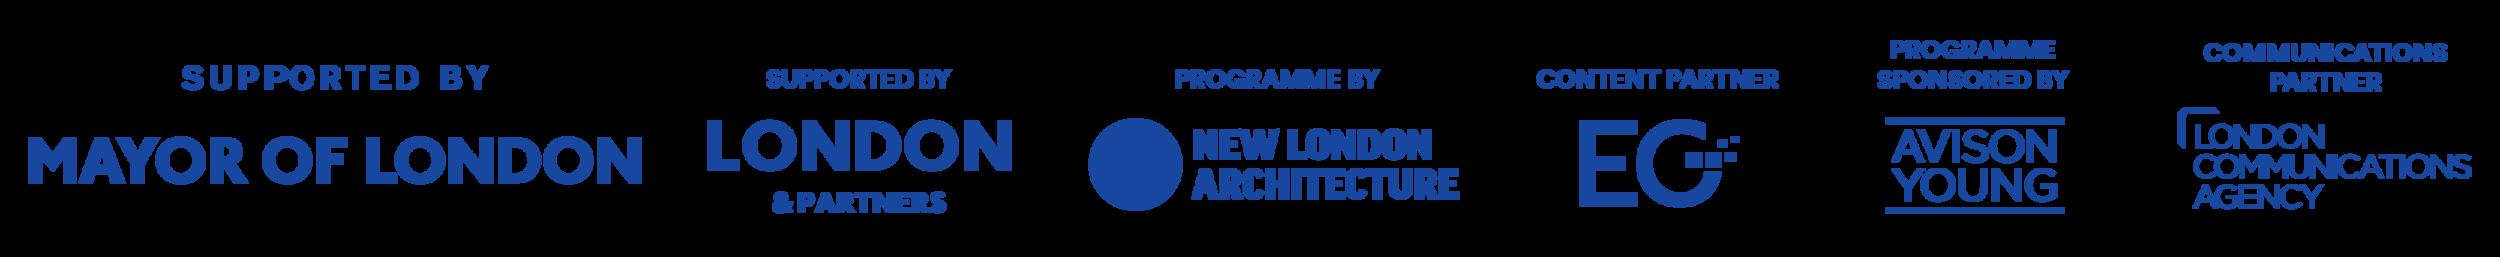 LONatMIPIM Logo assets for website_040219.png